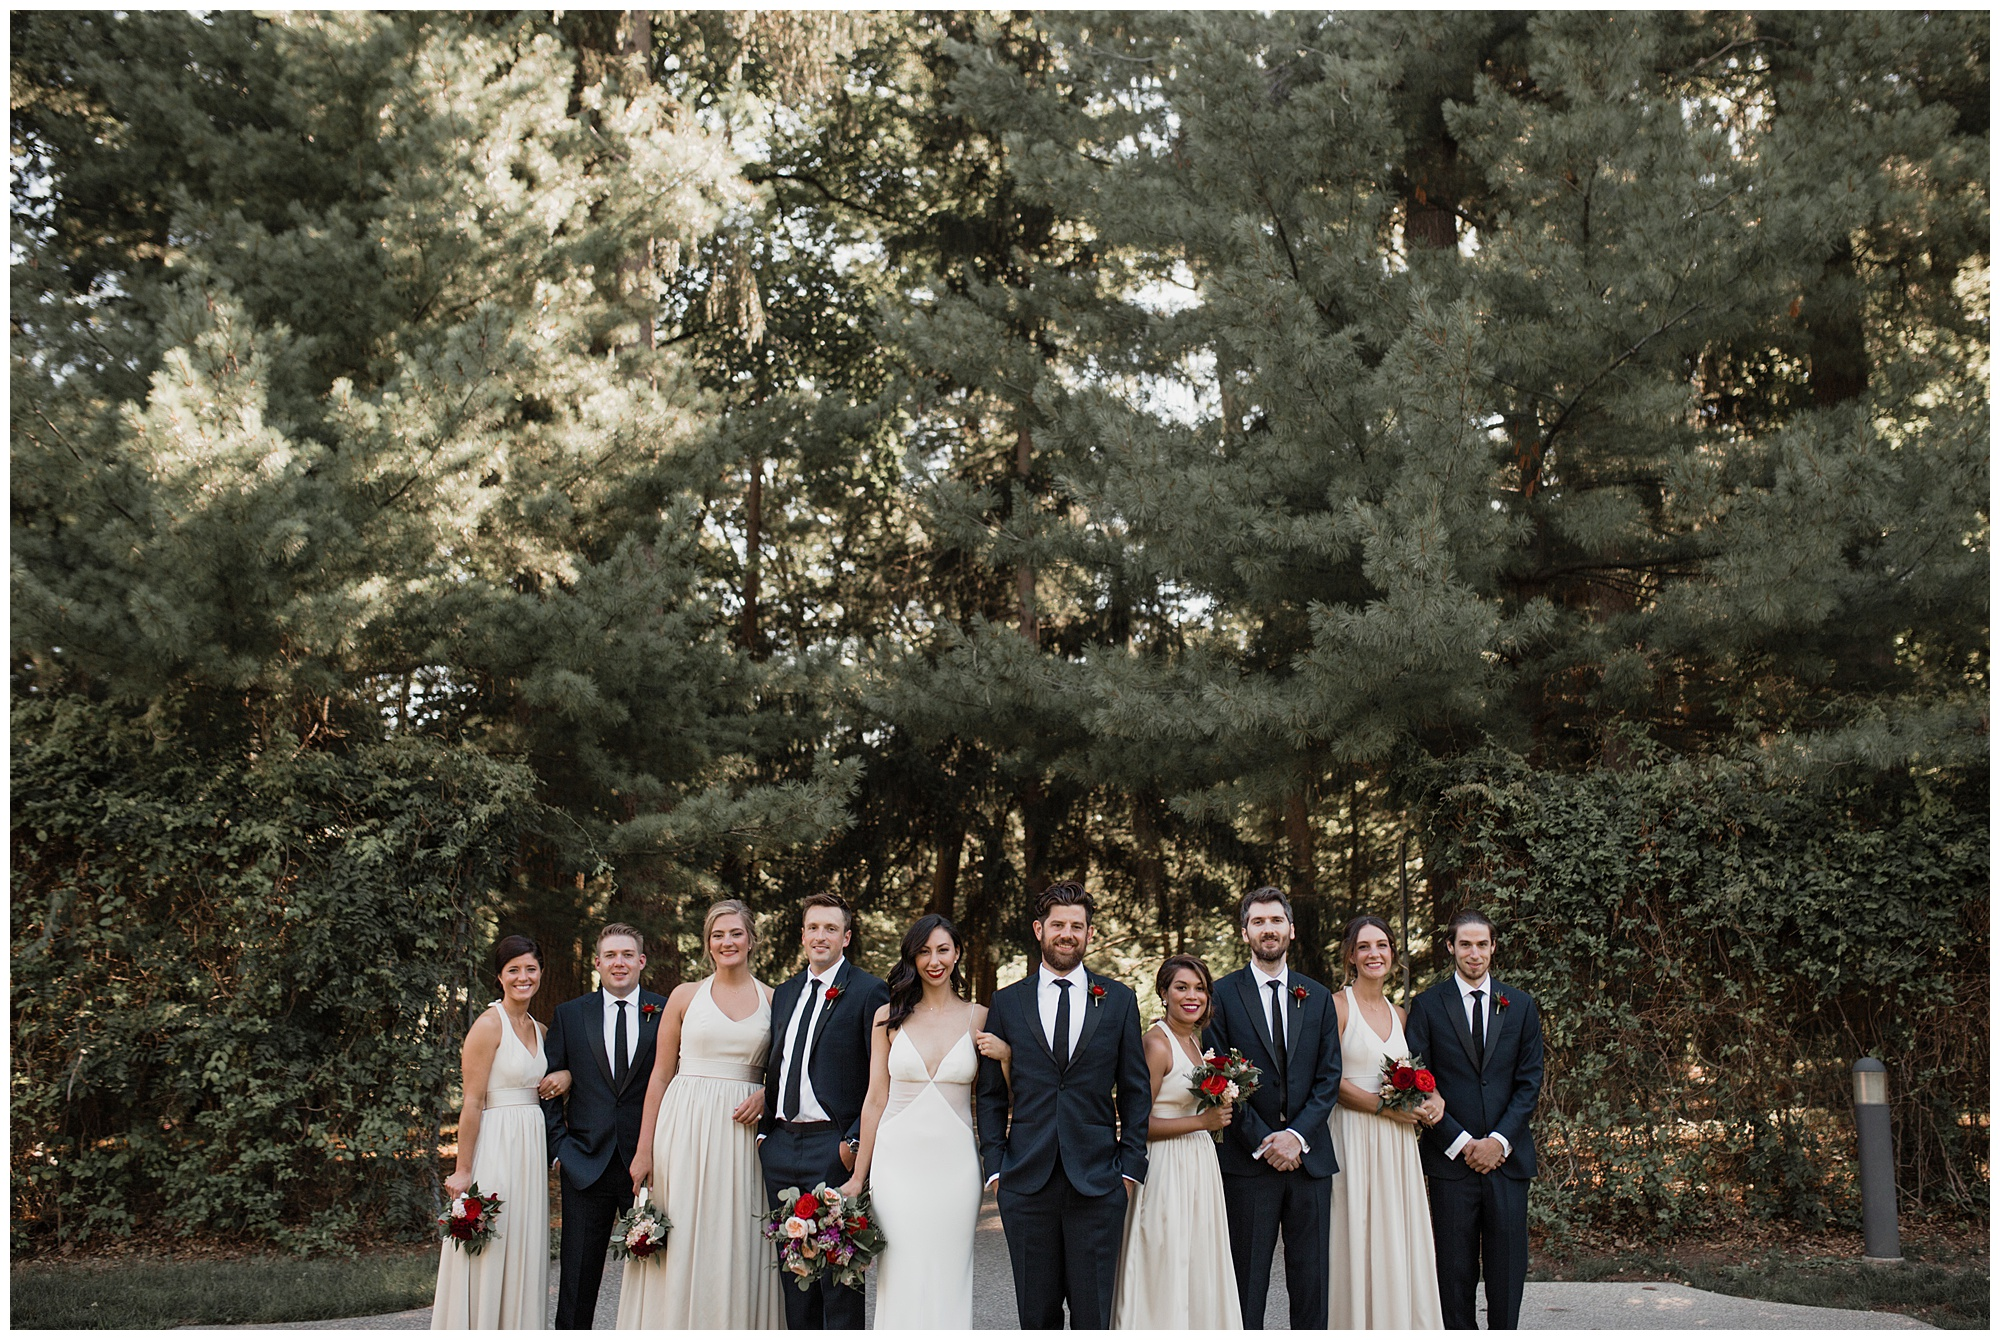 allerton_park_wedding_champaign_il_chicago_wright_photographs_ne_0077.jpg